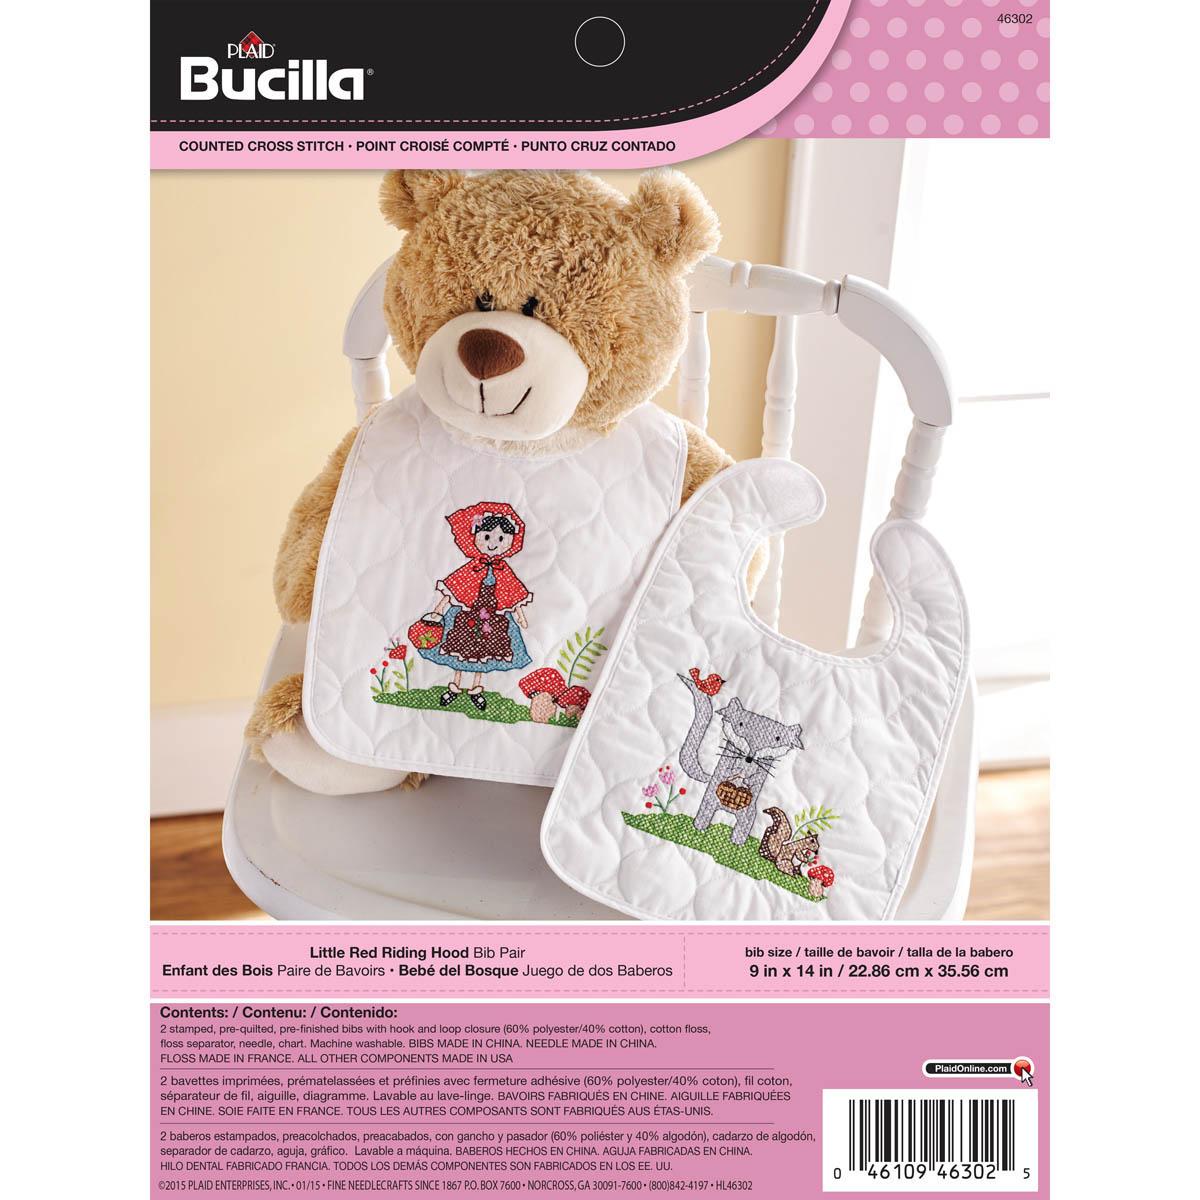 Bucilla ® Baby - Stamped Cross Stitch - Crib Ensembles - Little Red Riding Hood - Bib Pair Kit - 463